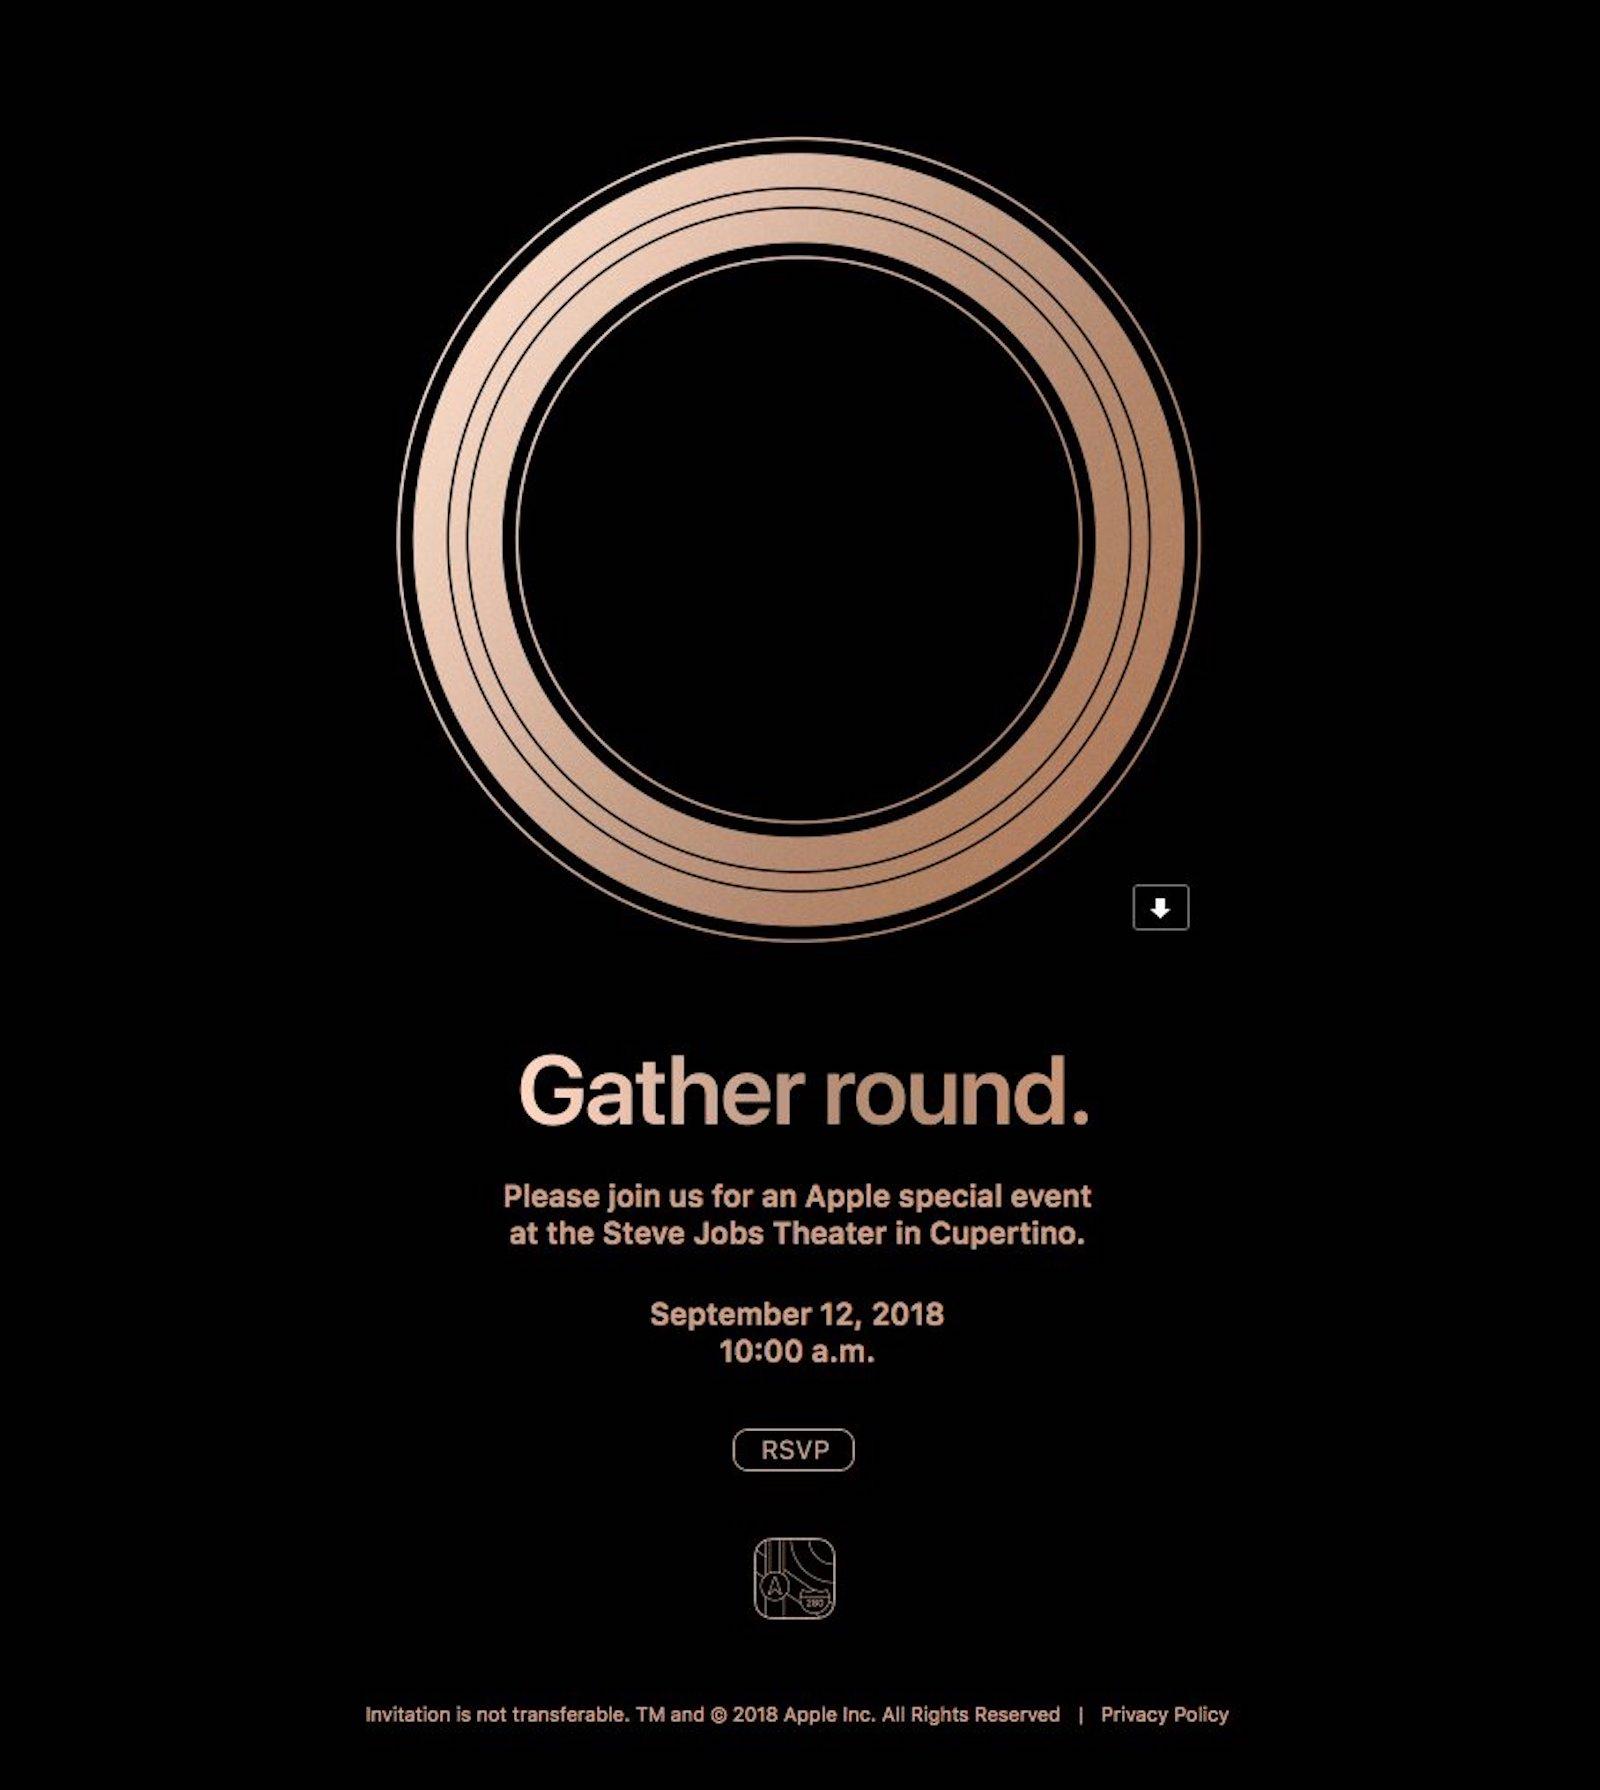 Gather-Aroung-iphone-2018-event.jpg